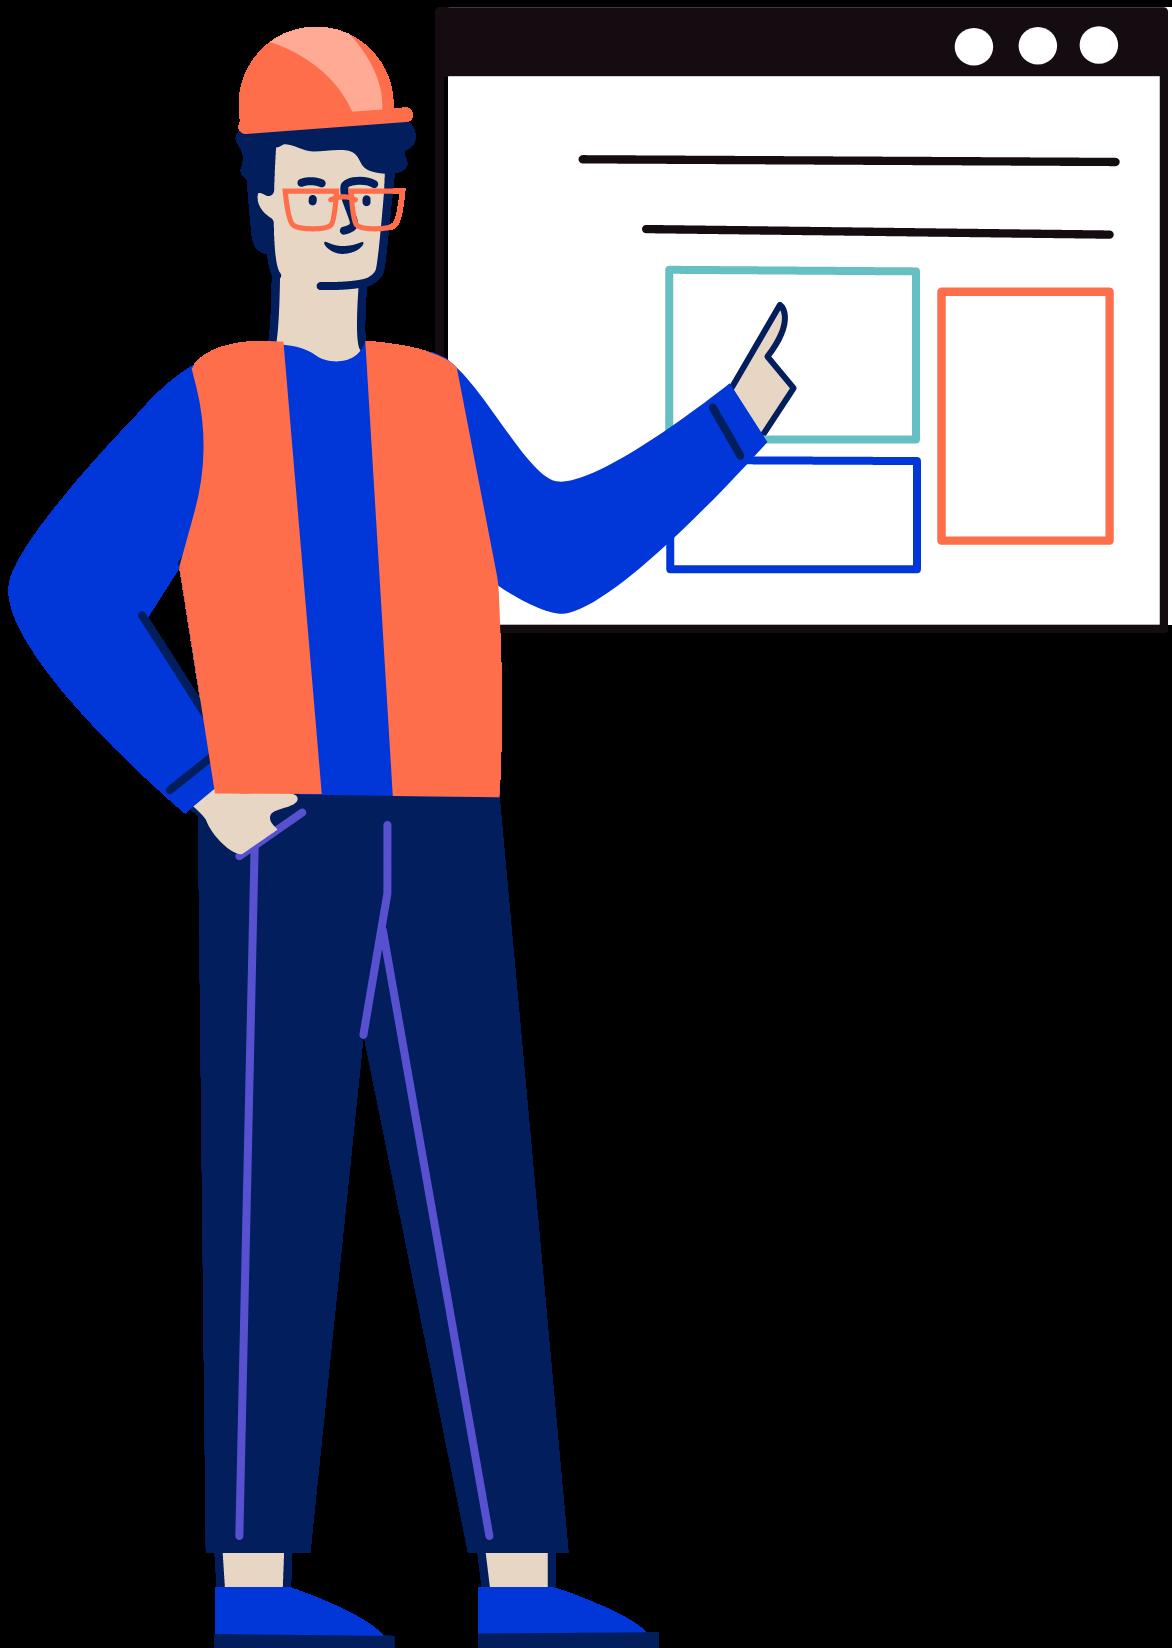 Veyor worker pointing